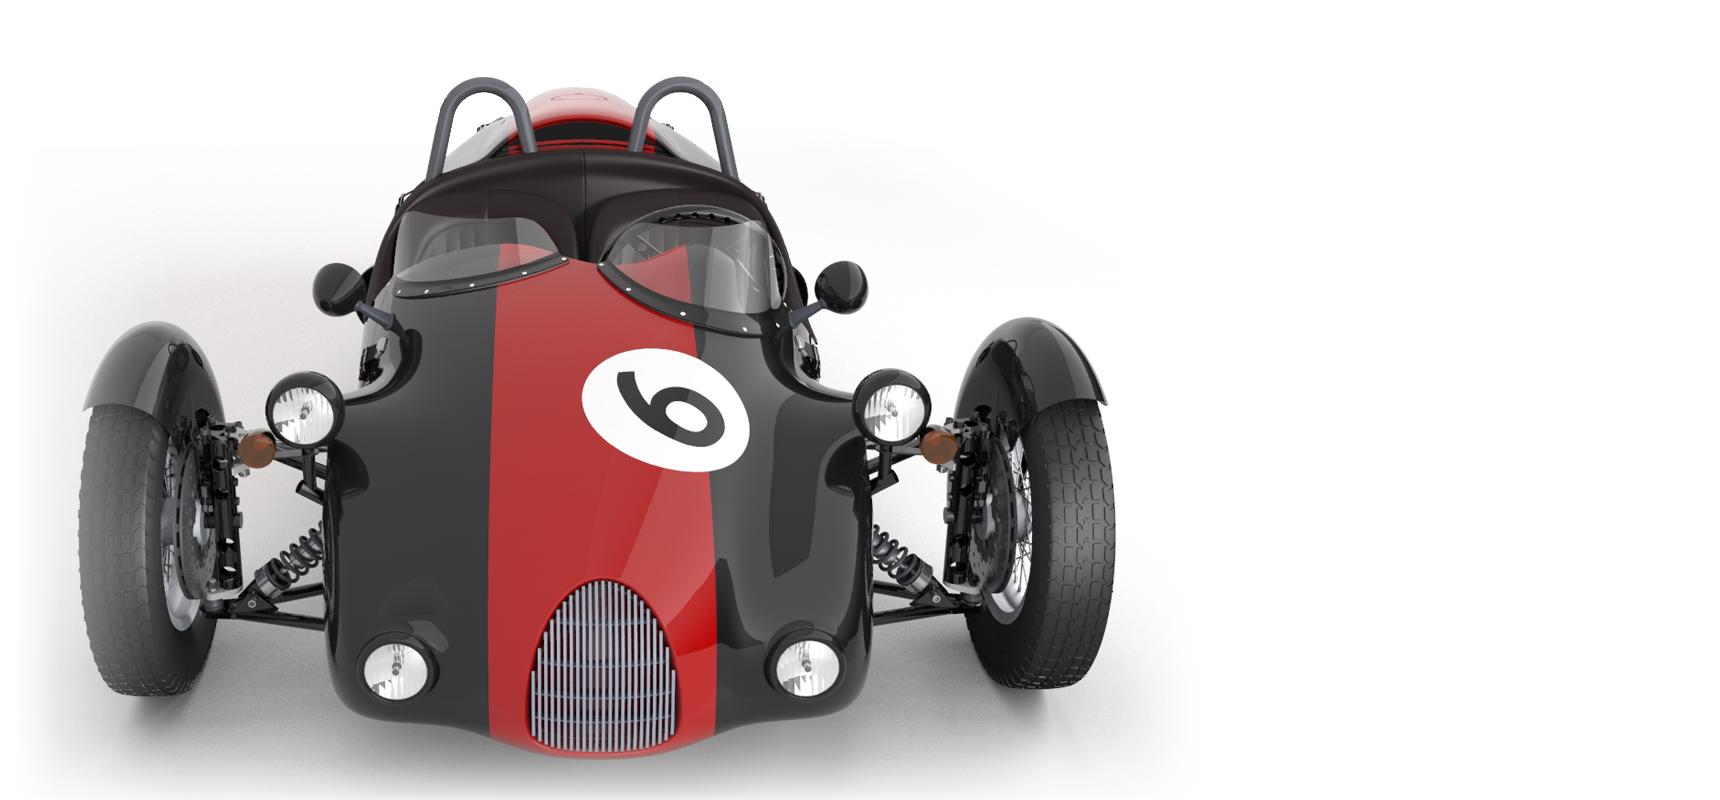 car design software car designing software 3d car 3d design online Rhino 6 for Windows